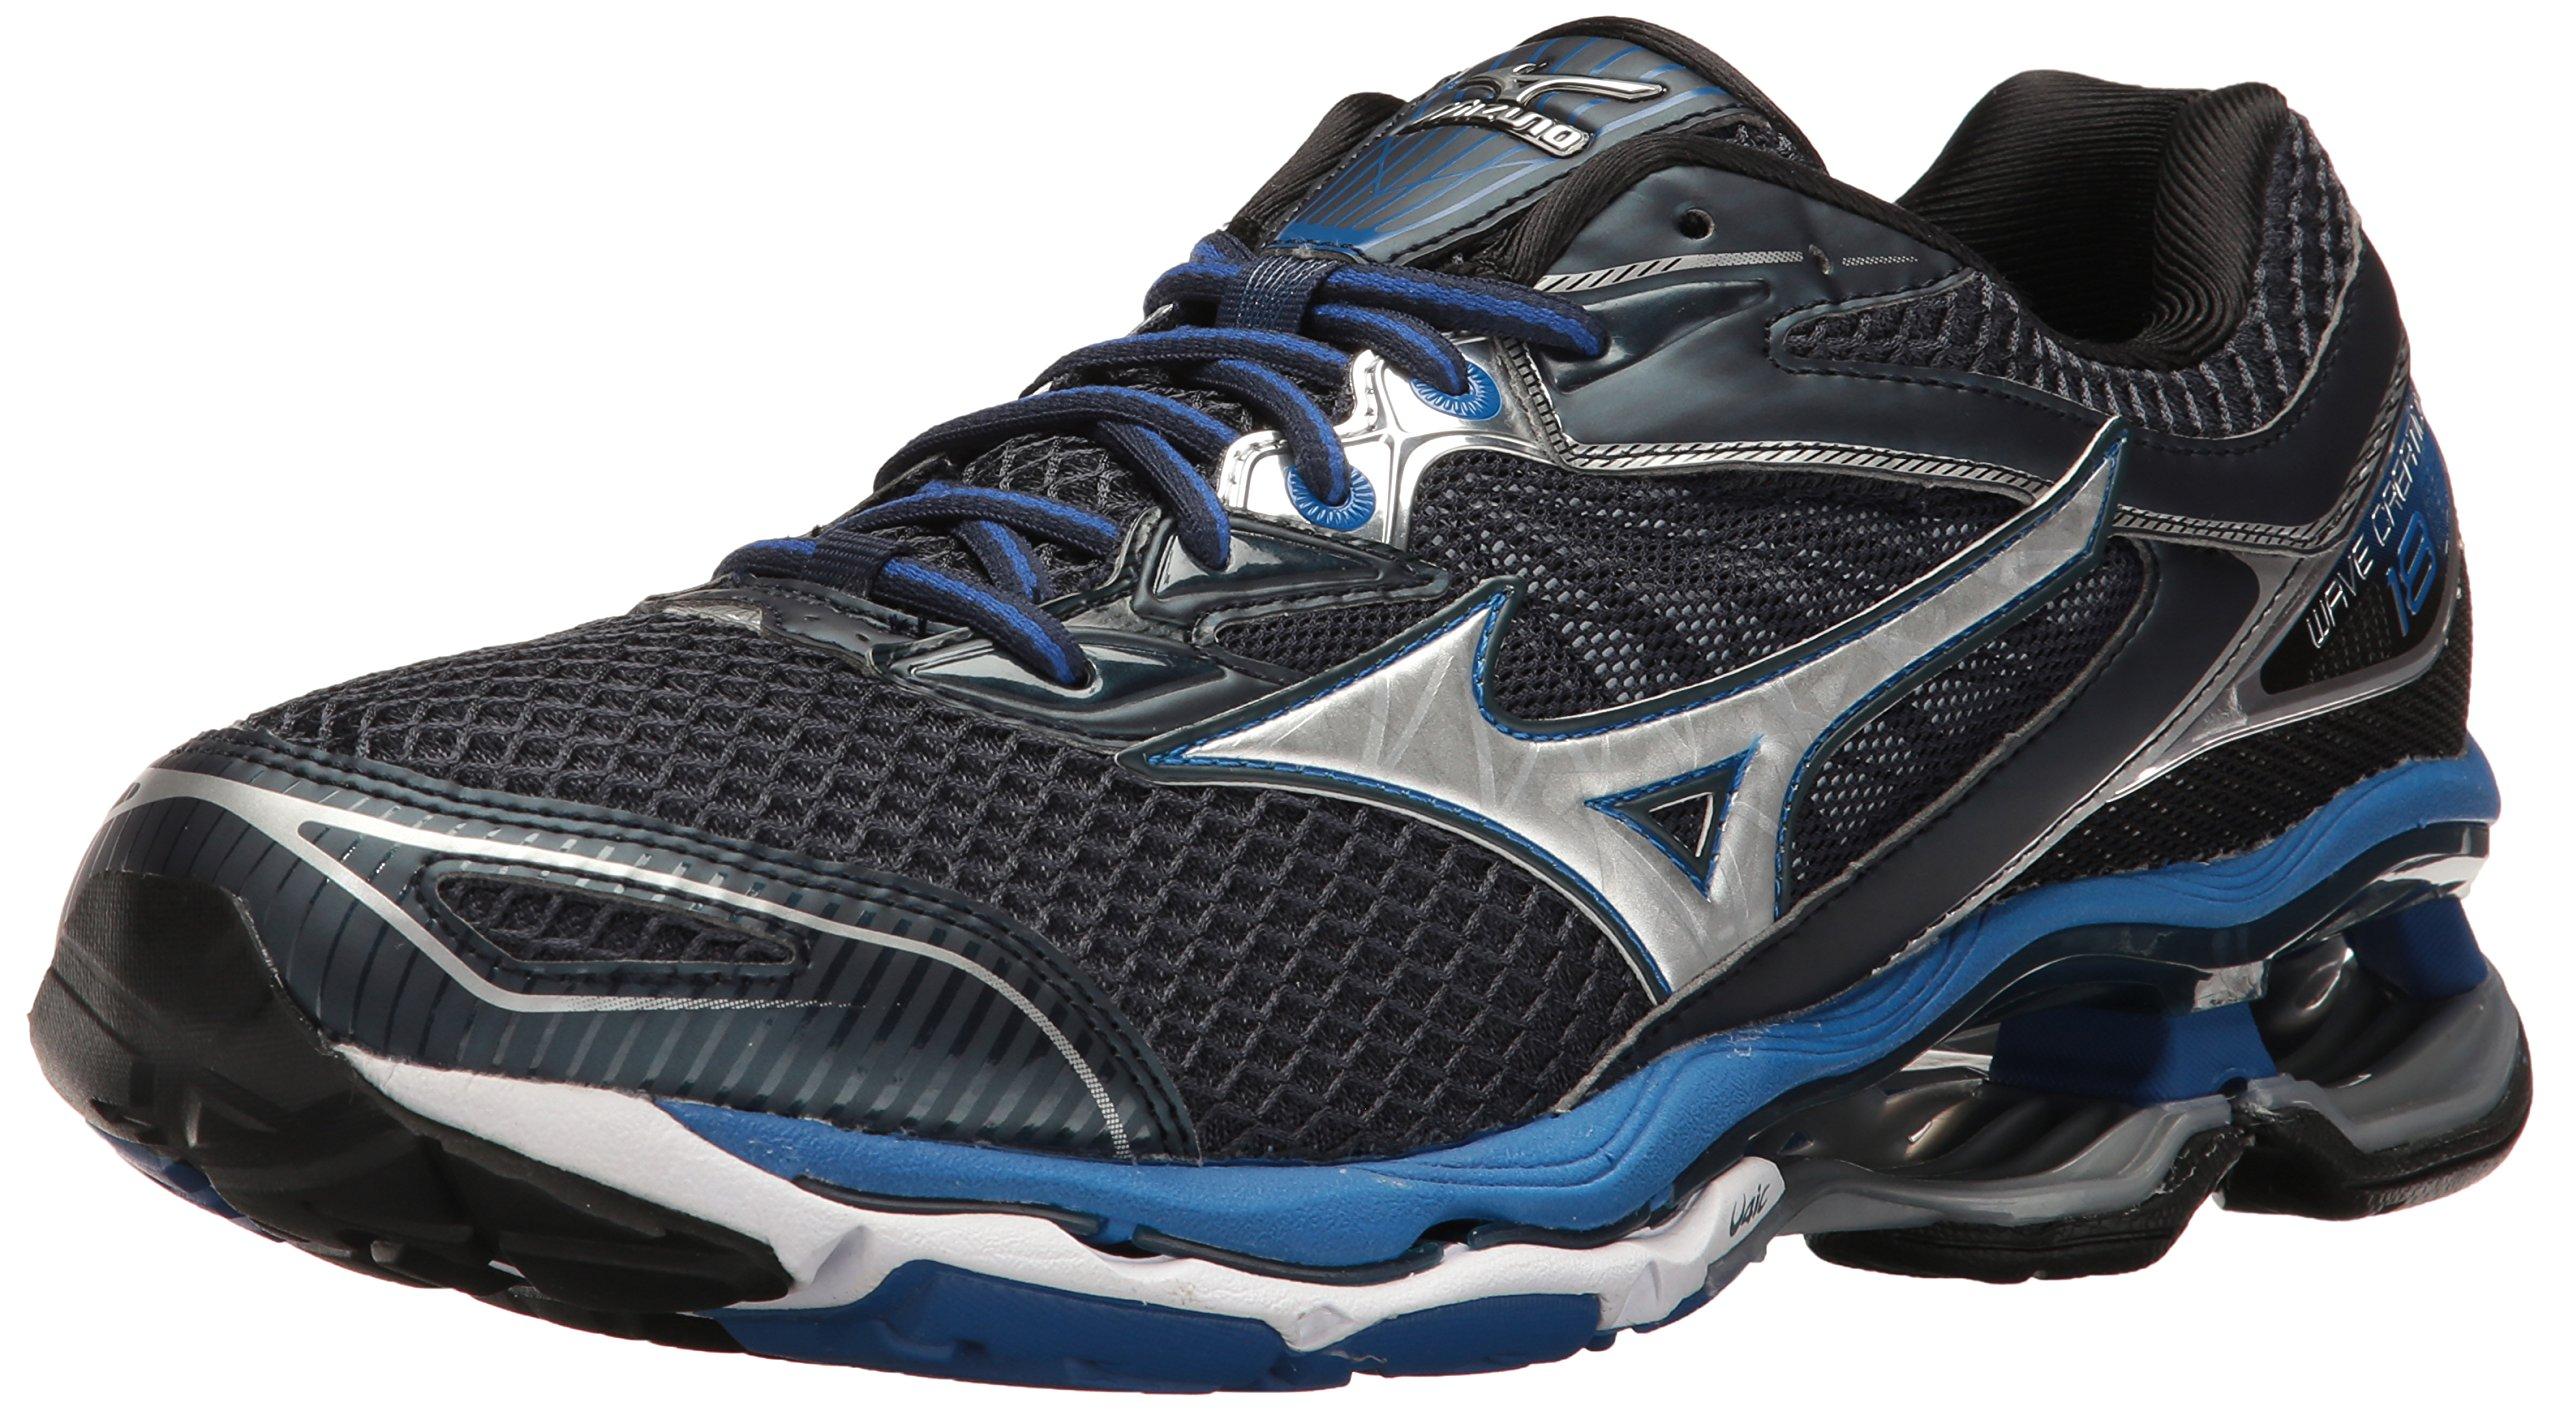 Mizuno Men's Wave Creation 18 Running Shoe, Dress Blue/Silver, 8 D US by Mizuno (Image #1)